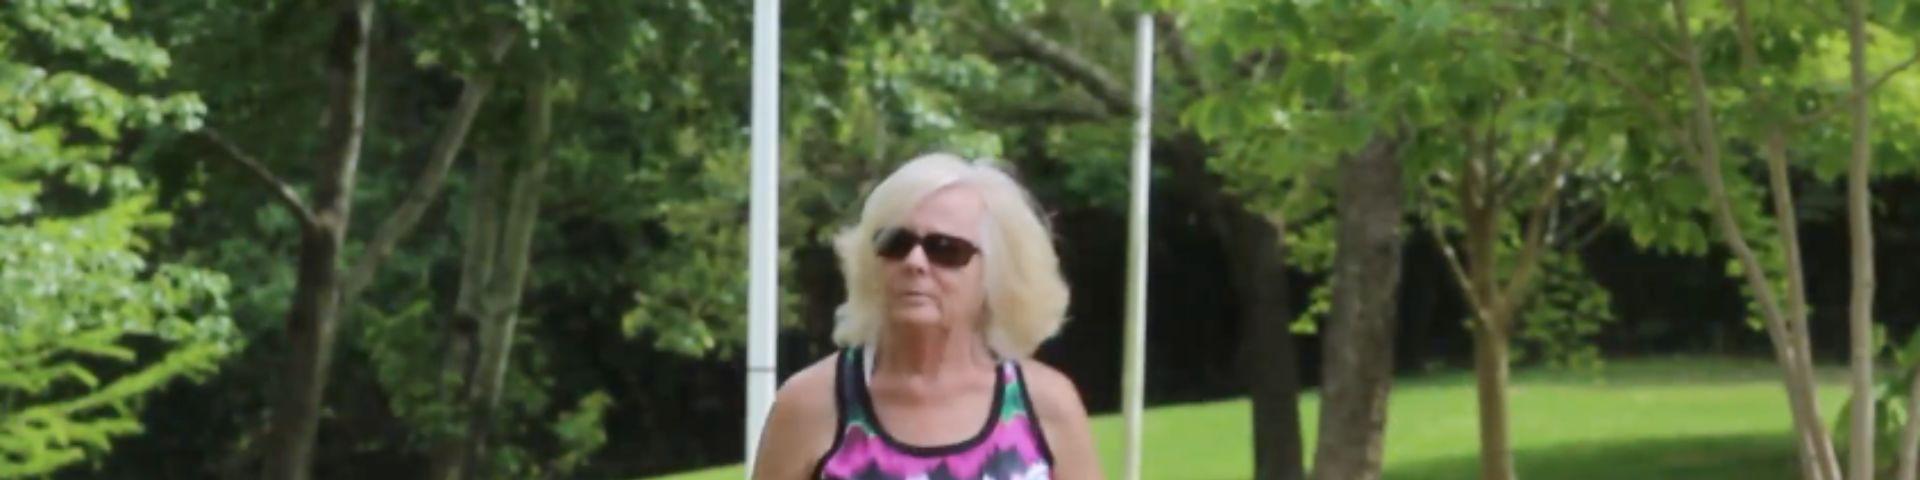 Pat Buffa Walked Away With Her Life